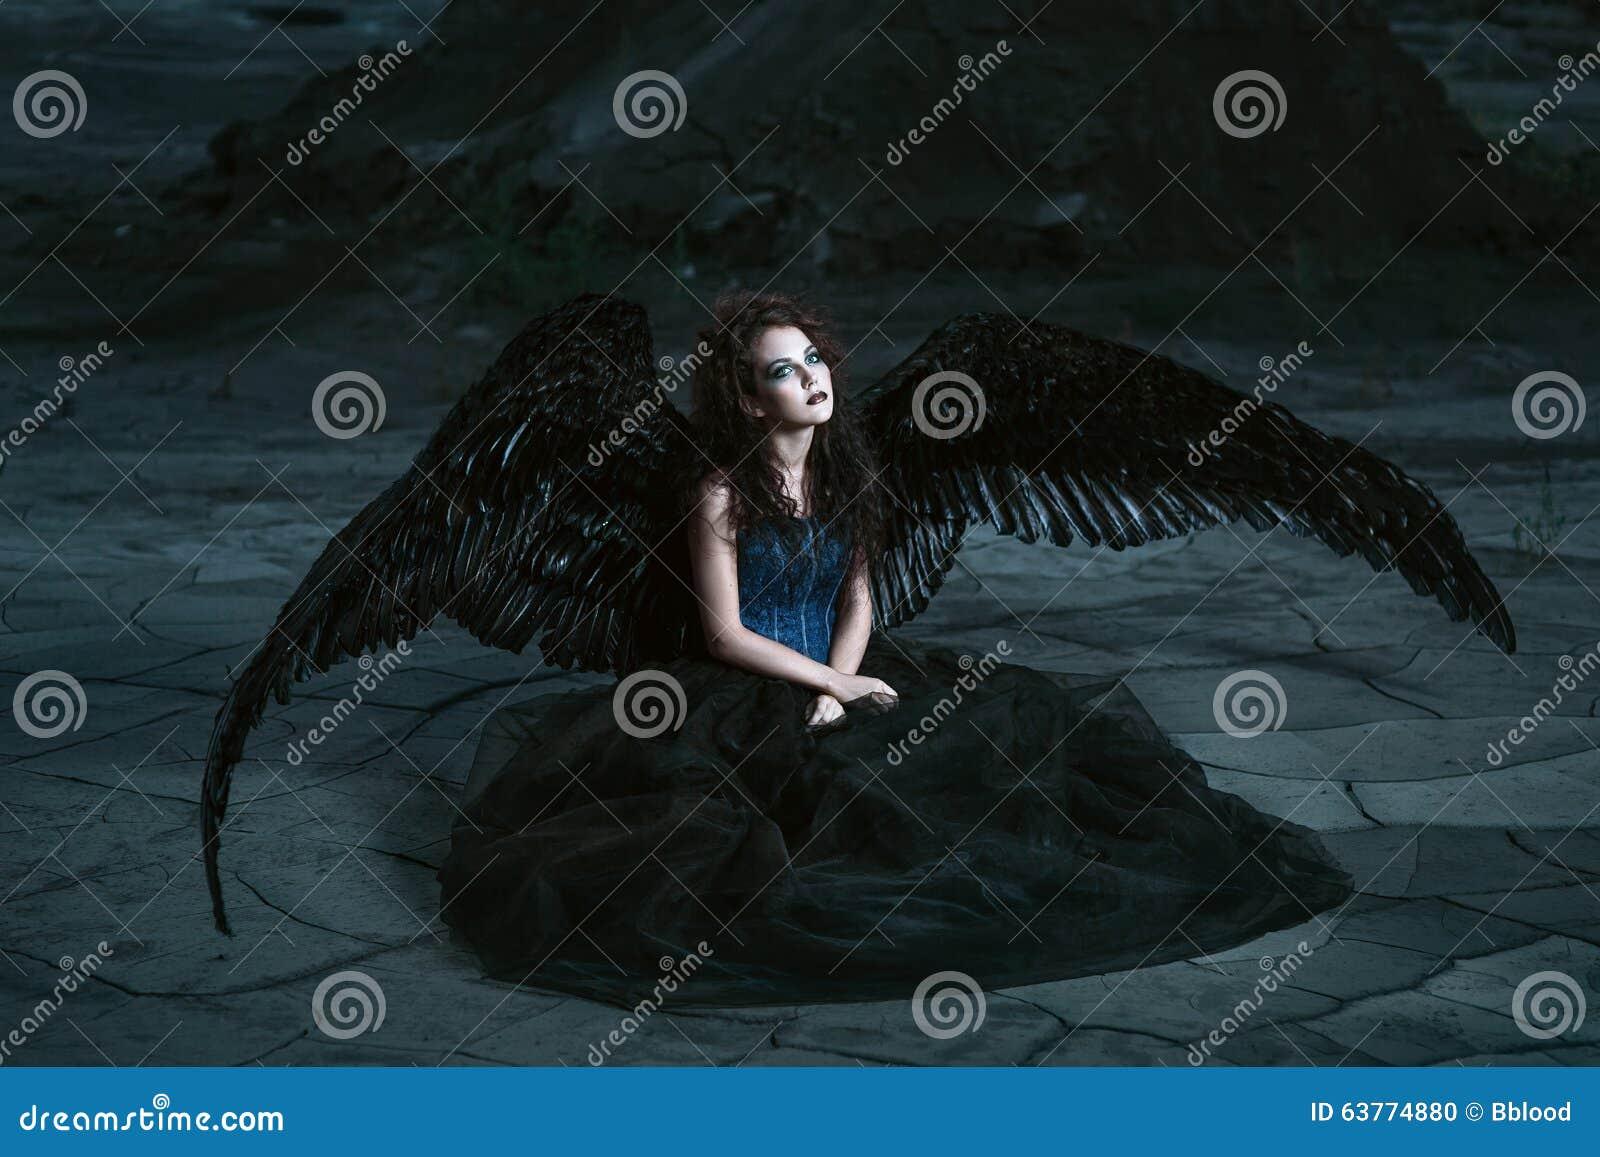 Halloween Costume Wings